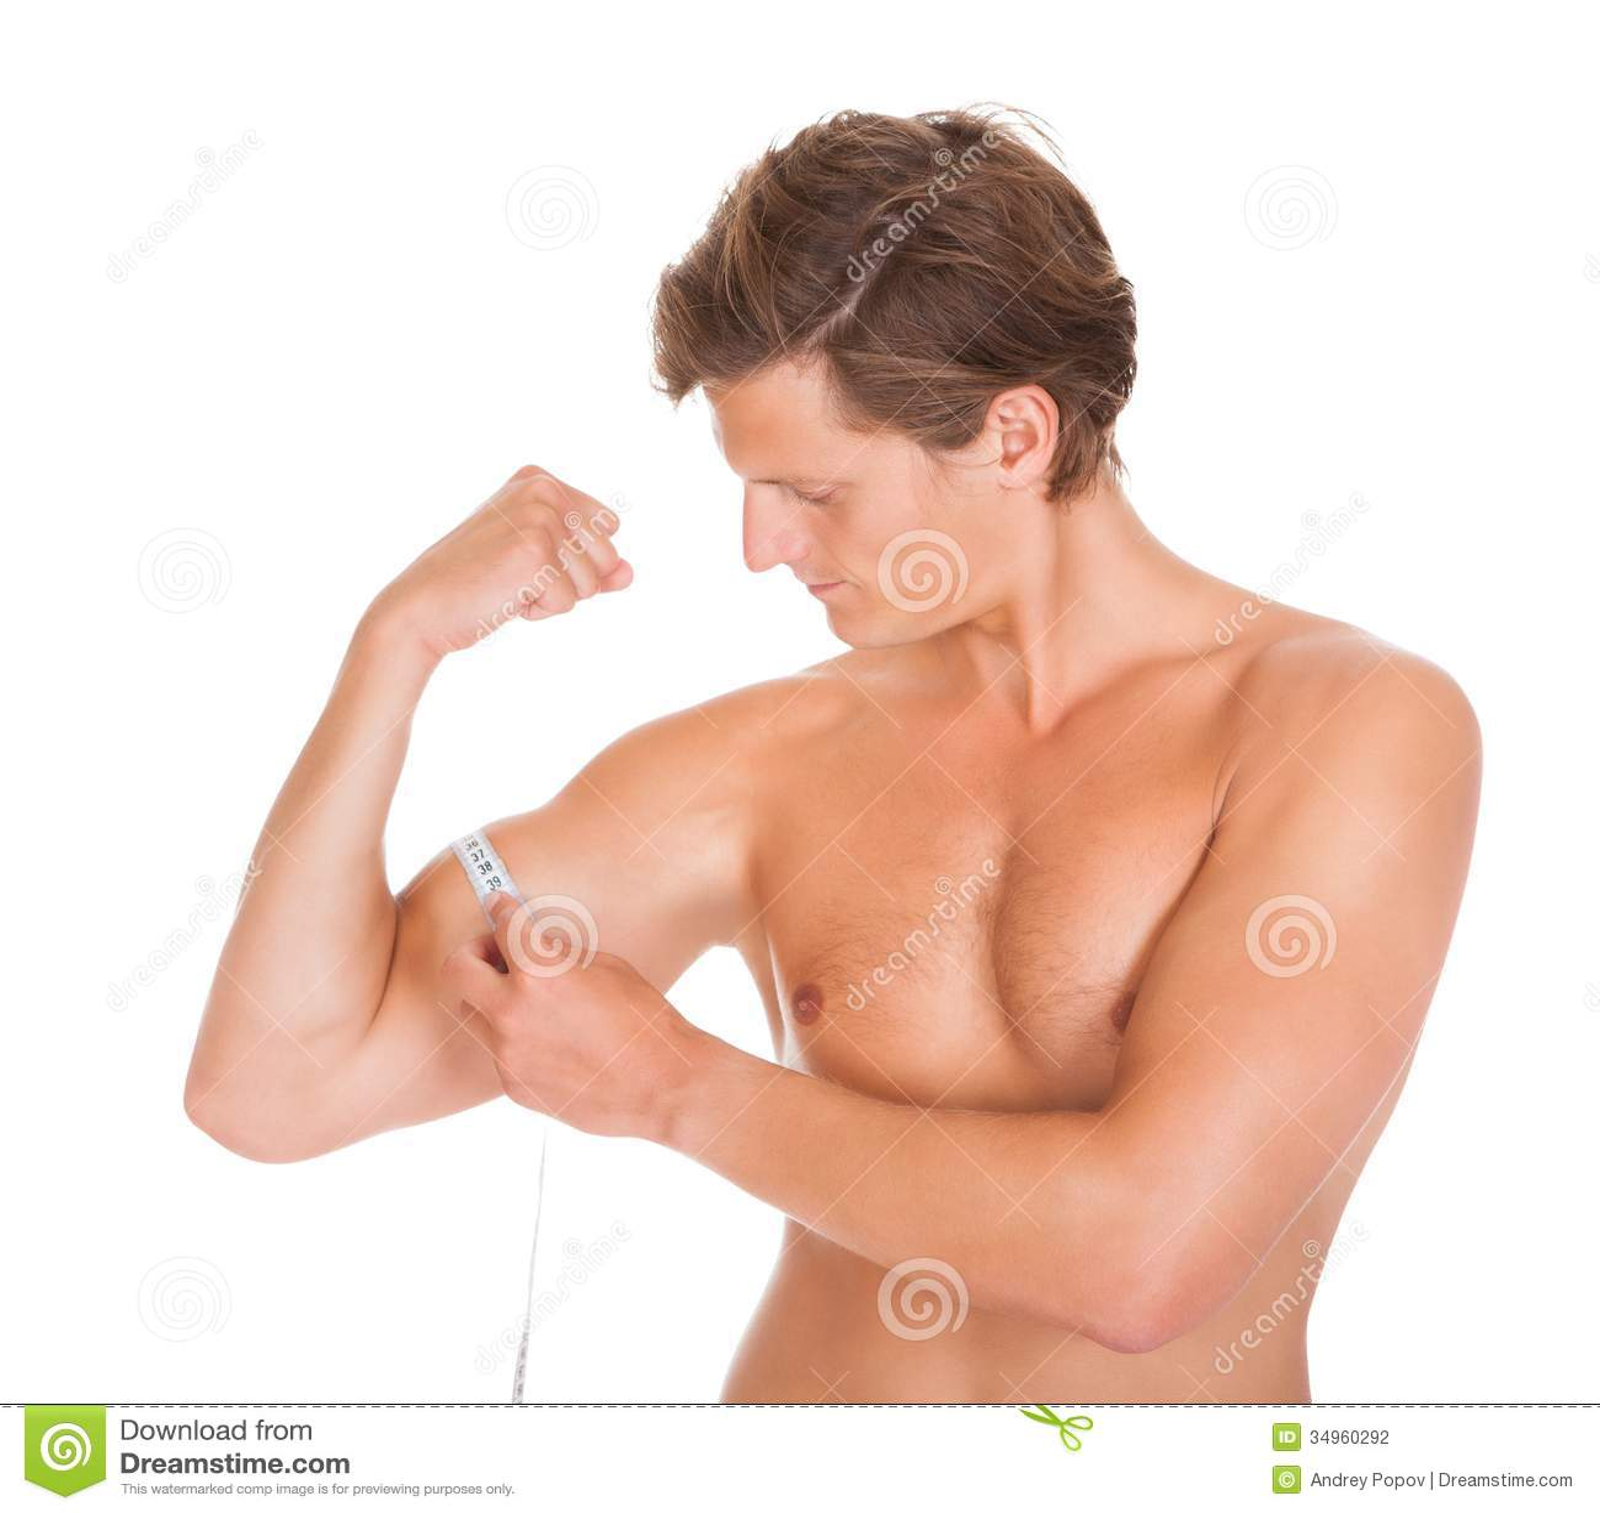 man measuring his biceps stock photography image 34960292. Black Bedroom Furniture Sets. Home Design Ideas